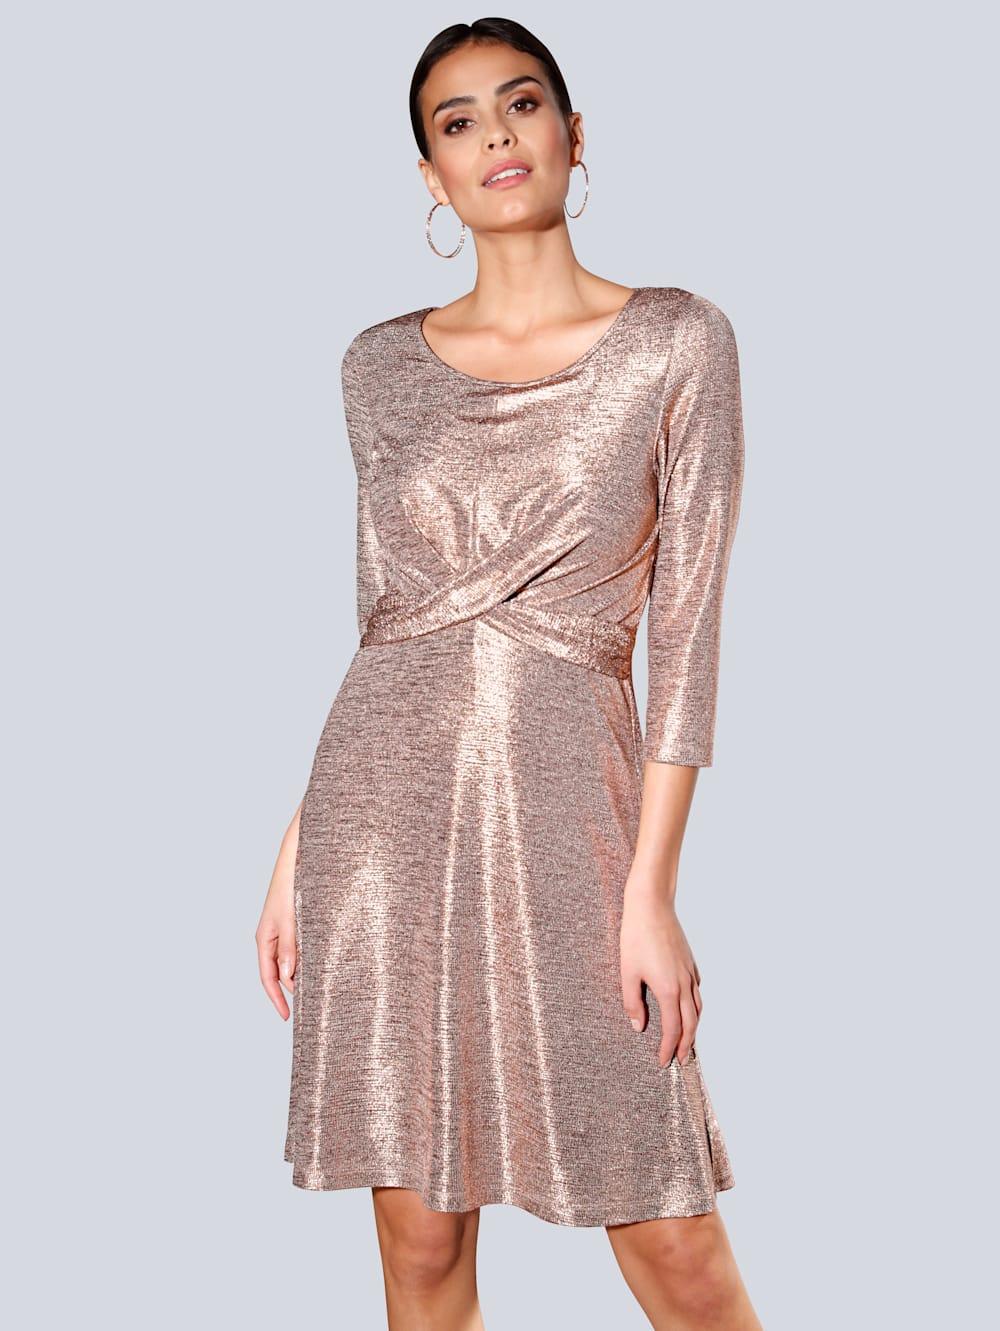 Alba Moda Kleid in Glitzer-Optik  Alba Moda